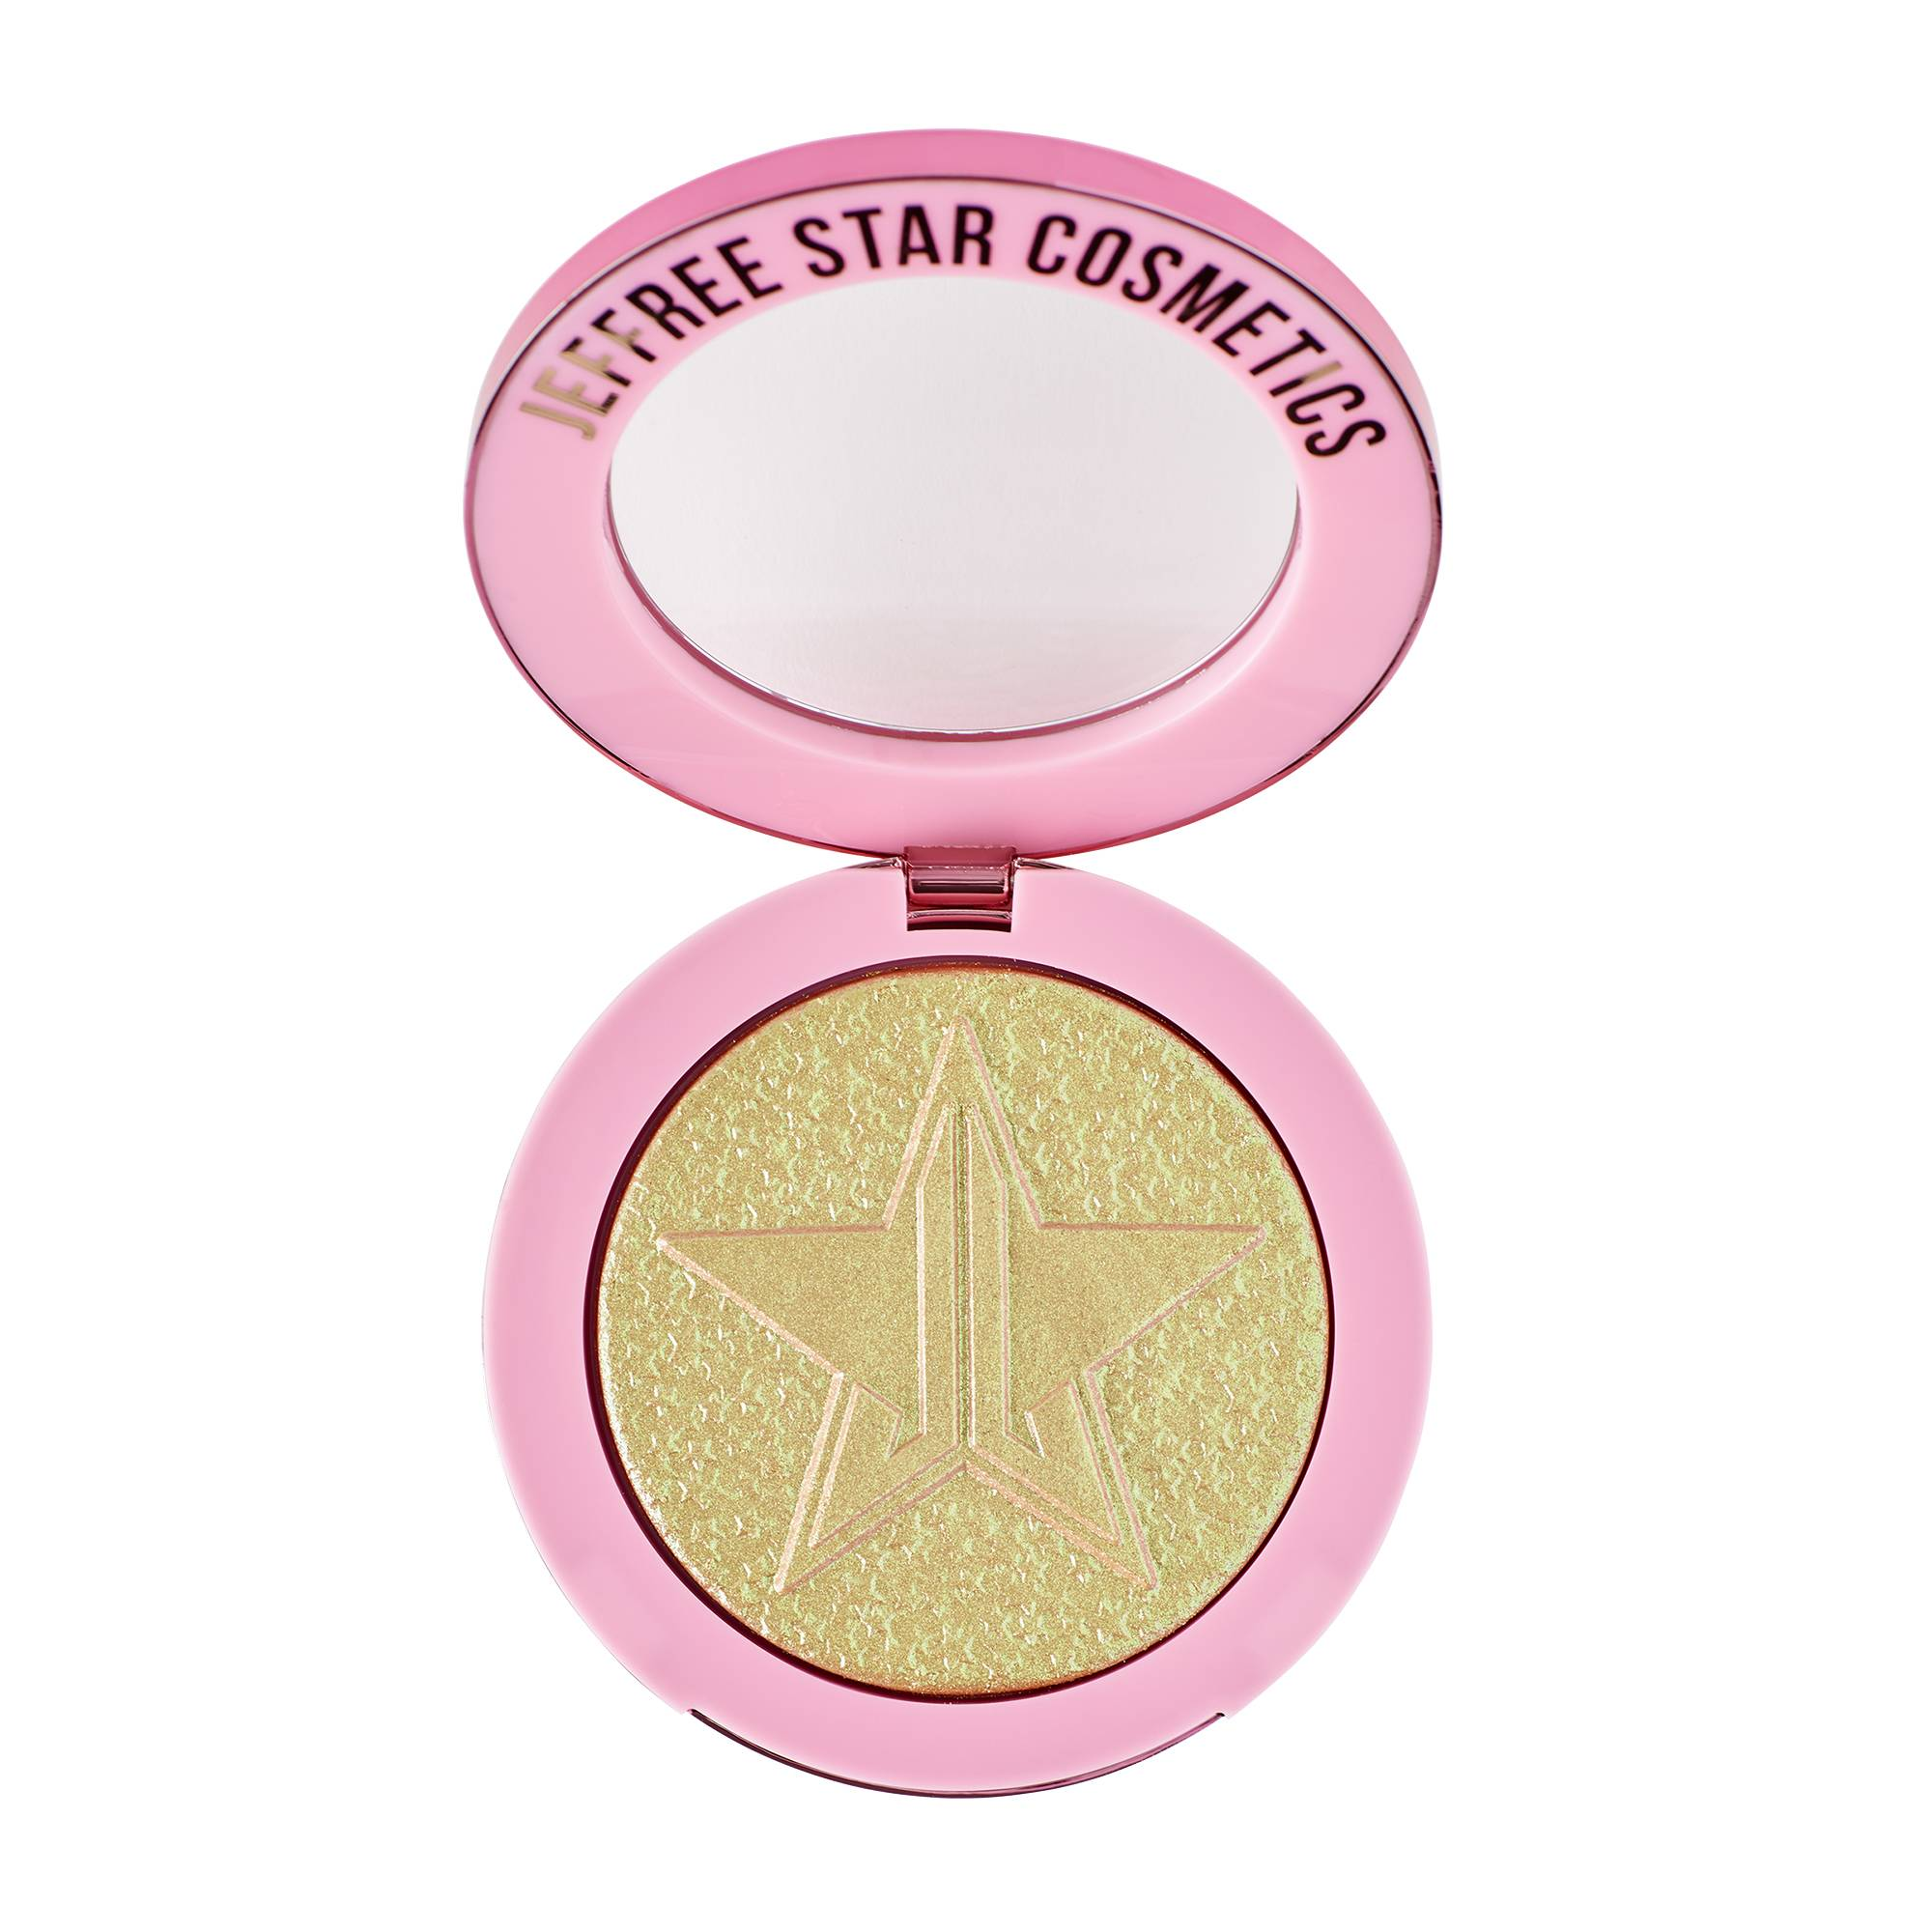 Jeffree Star Cosmetics Supreme Frost Money Honey